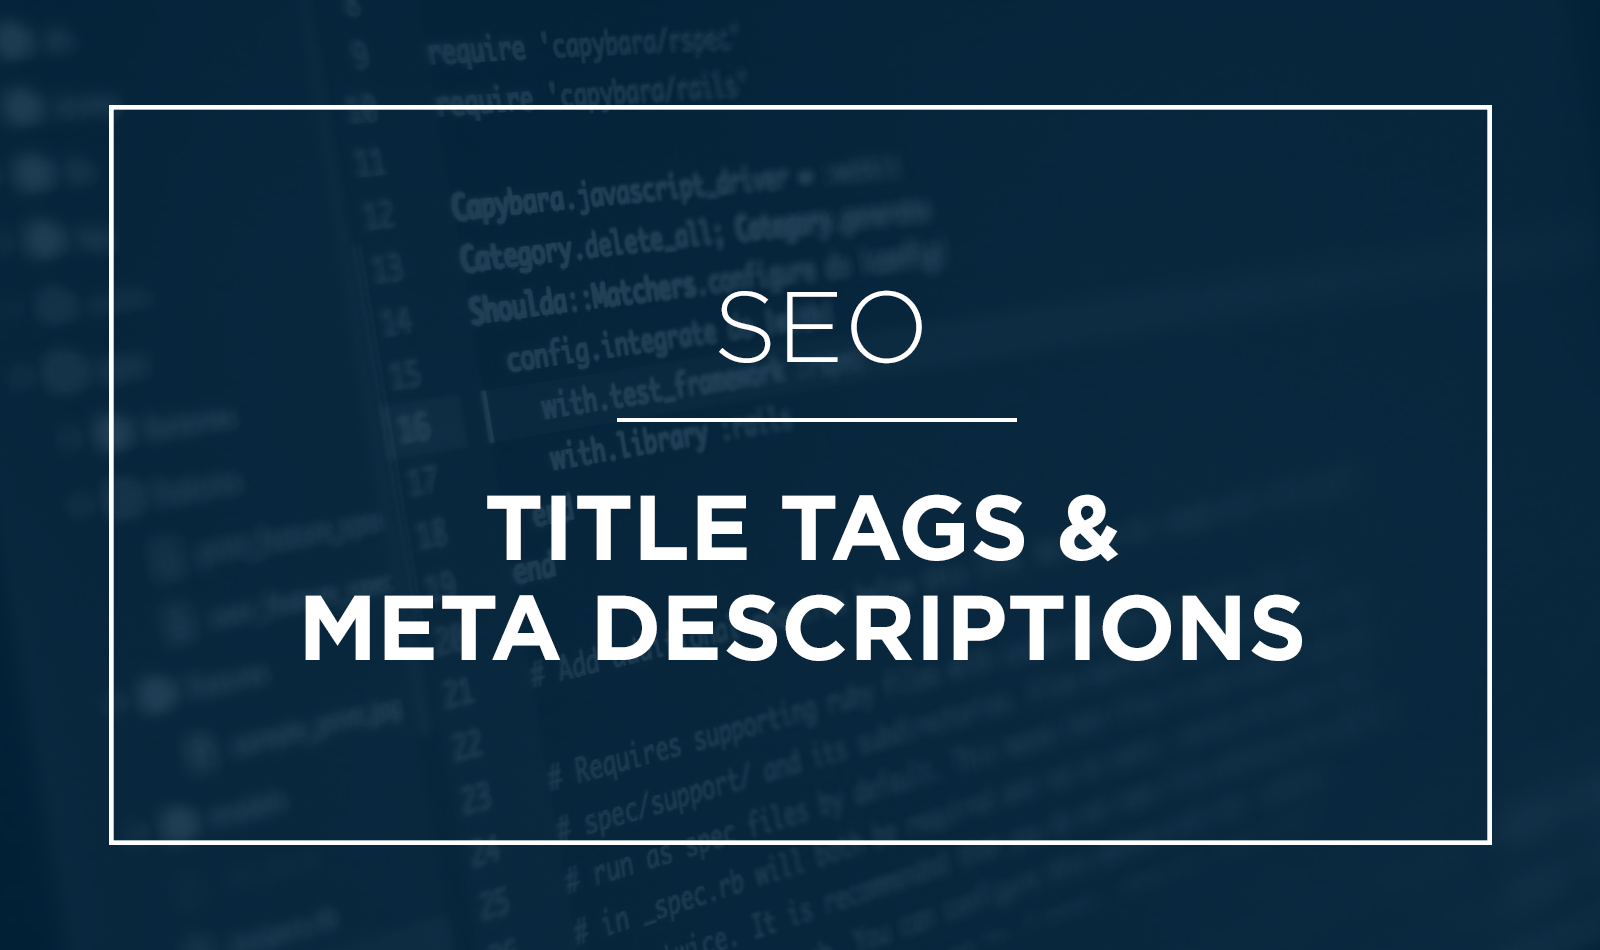 seo-title-tags-meta-description-featured